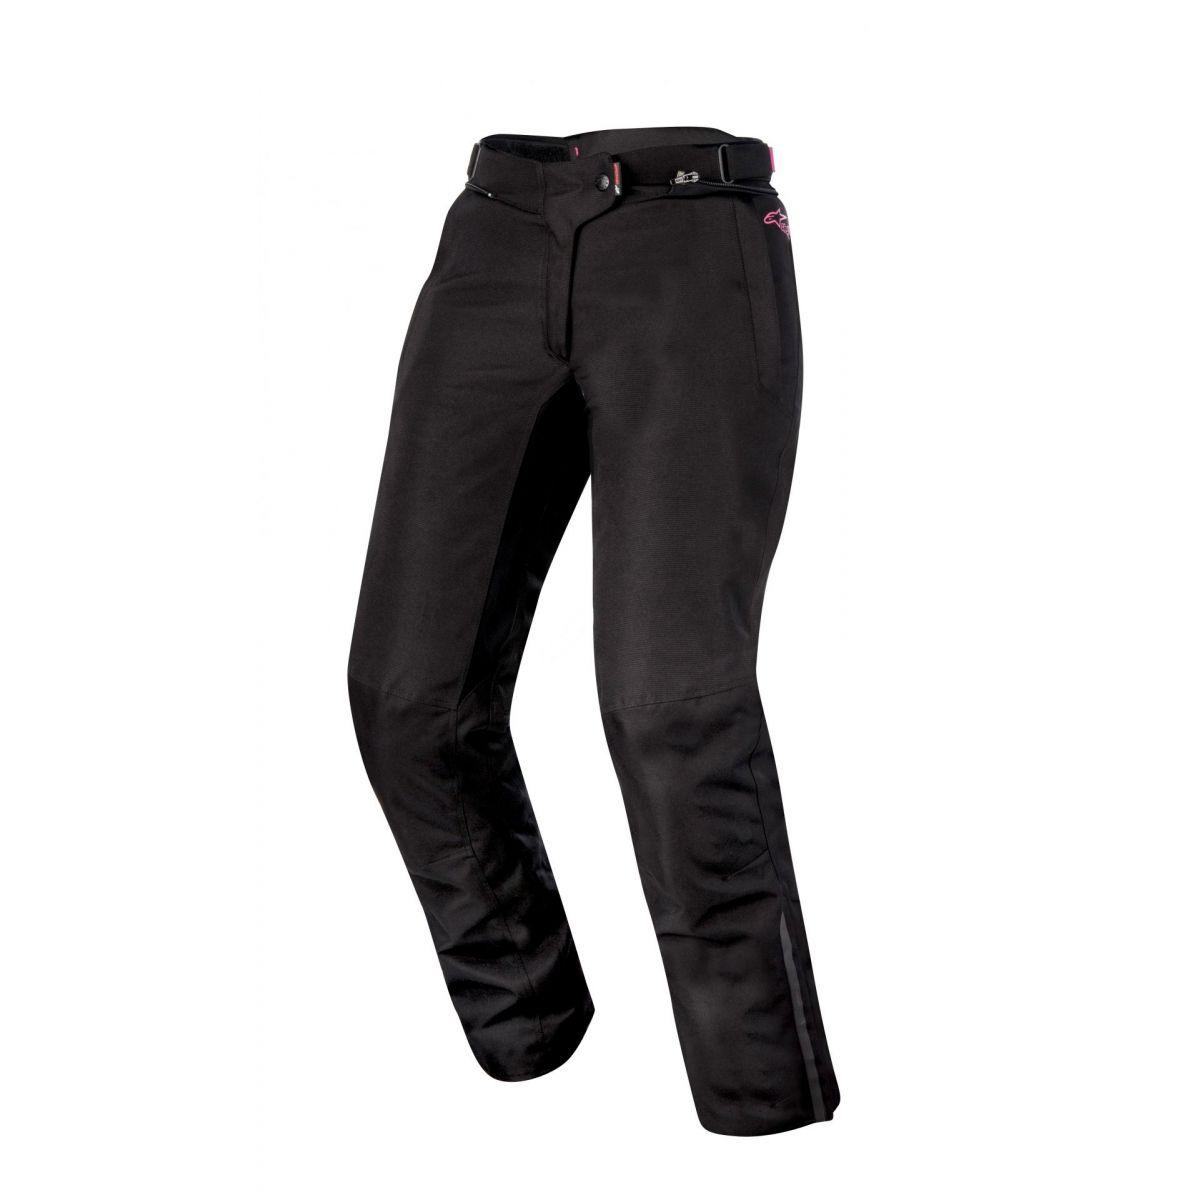 Calça Alpinestars Stella Protean Drystar® (Black/Purple)  - Nova Suzuki Motos e Acessórios